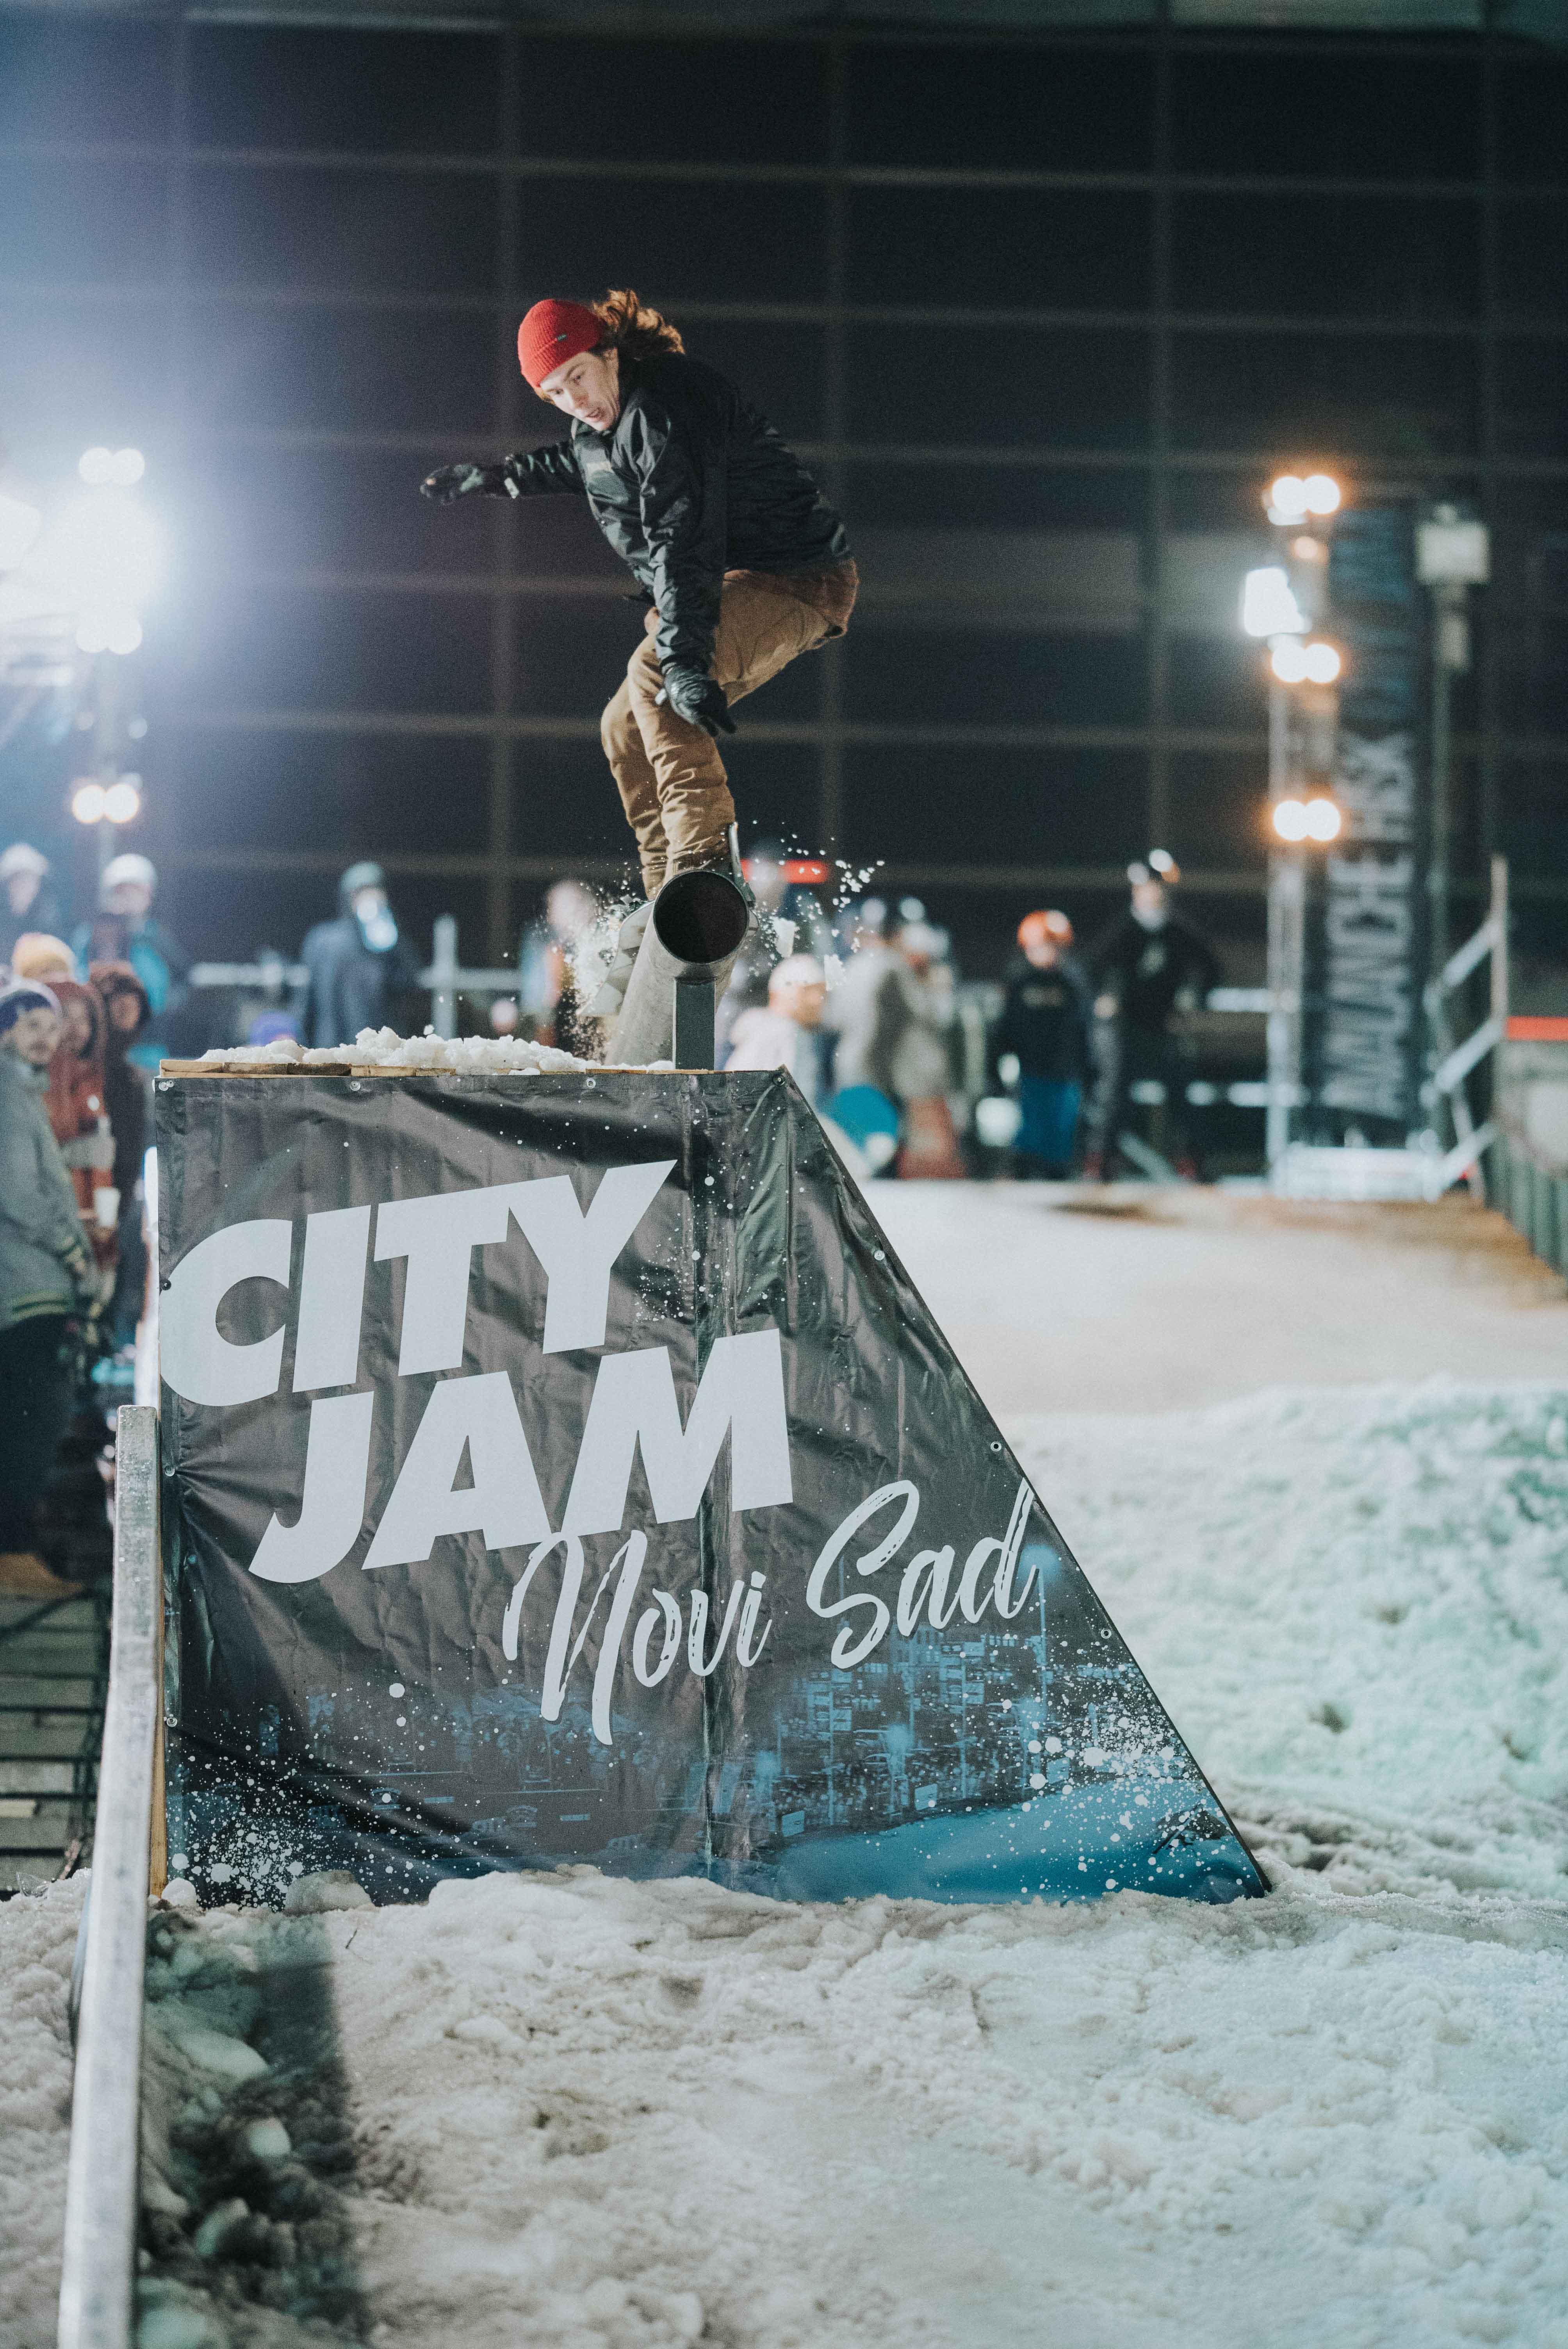 Avalanche Risk City Jam 1